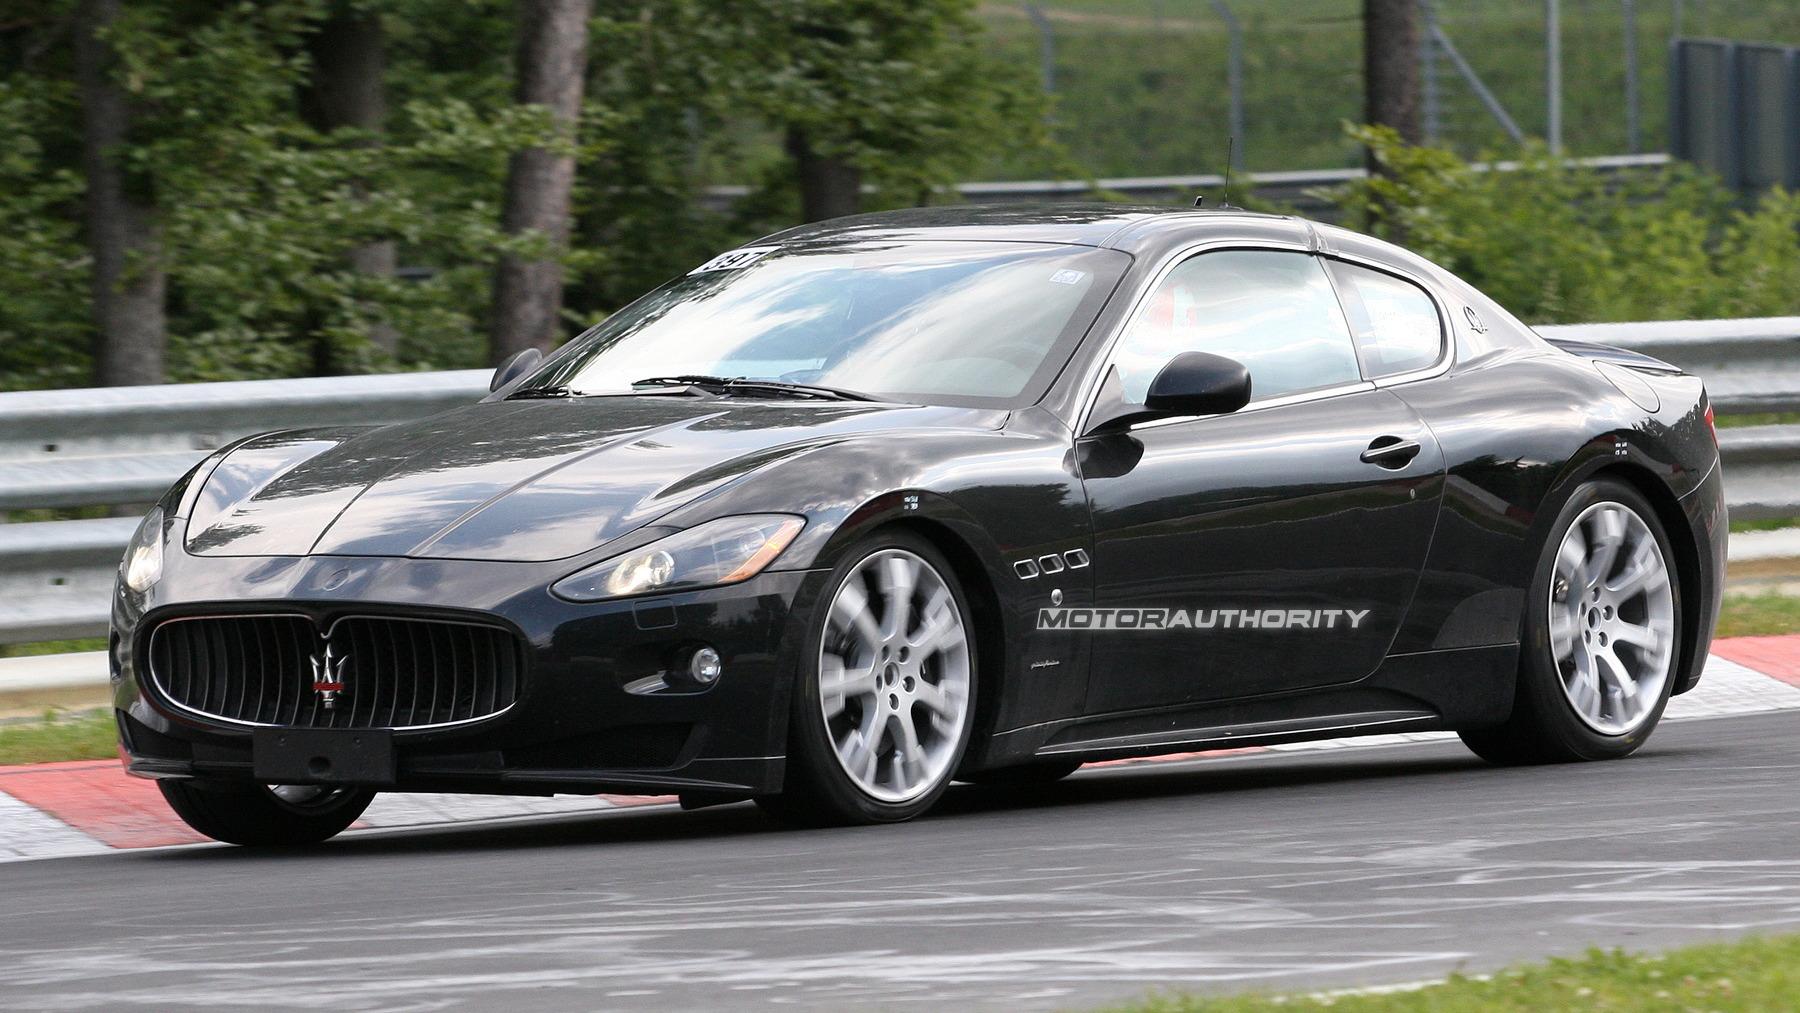 Maserati Gran Turismo mystery mule spy shots